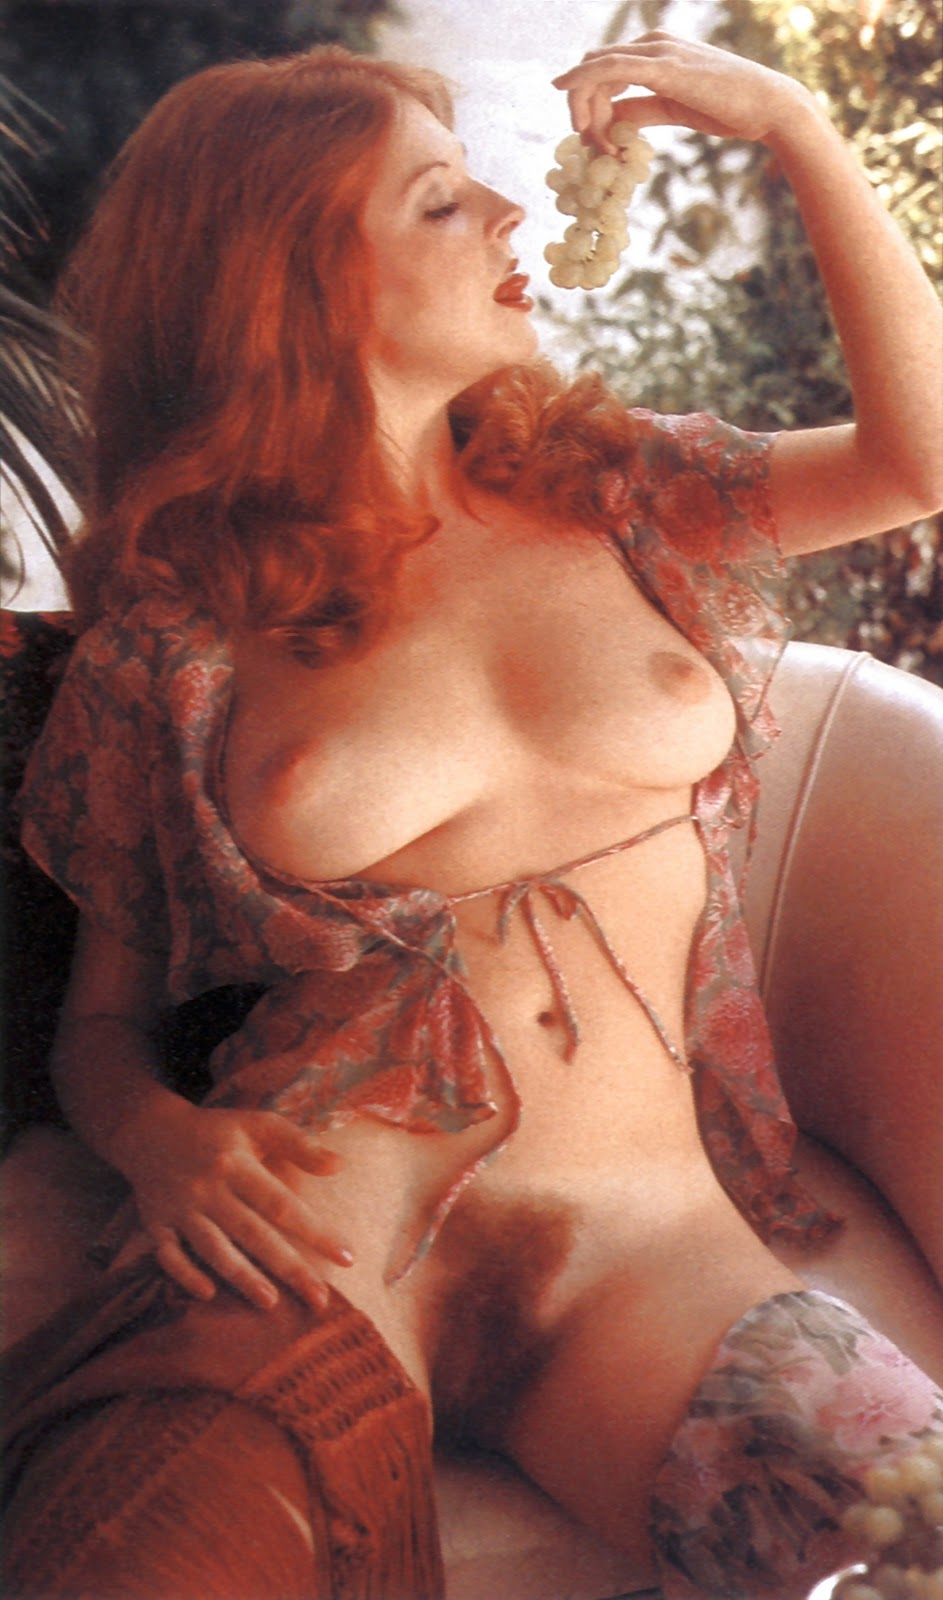 Luvia petersen nude